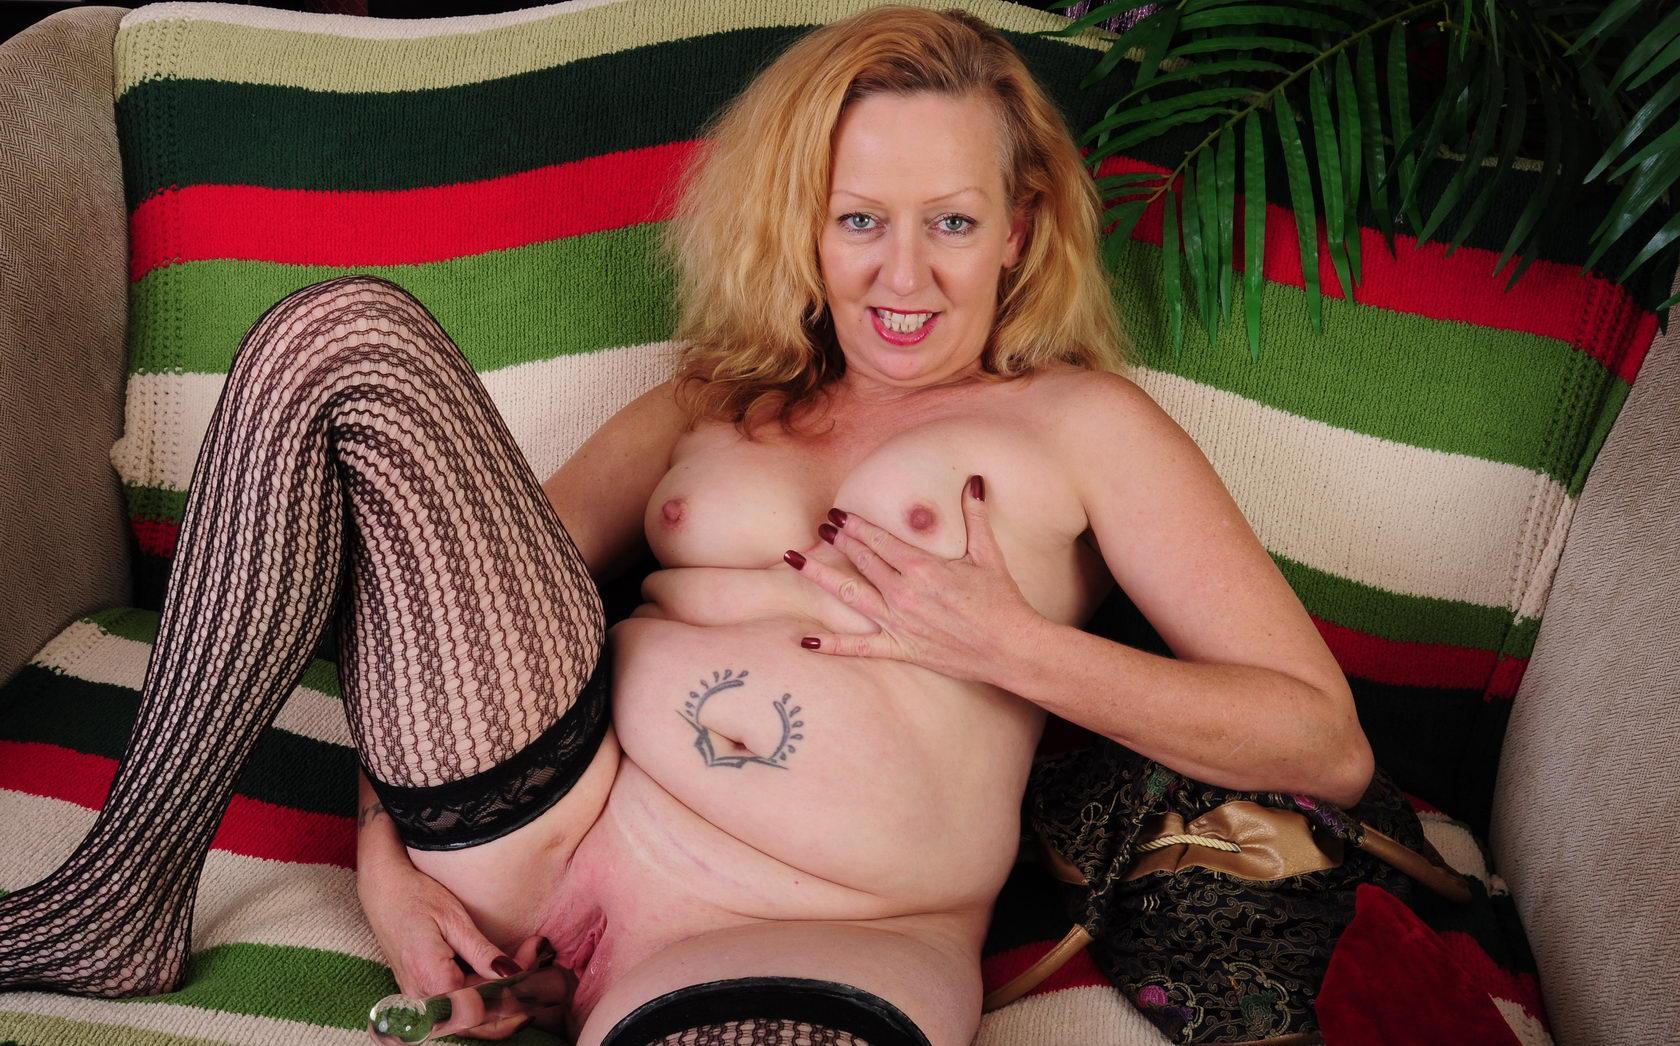 Macy a 61 old charming HOMEMADE GRANNY a hot american granny hottie masturbating here